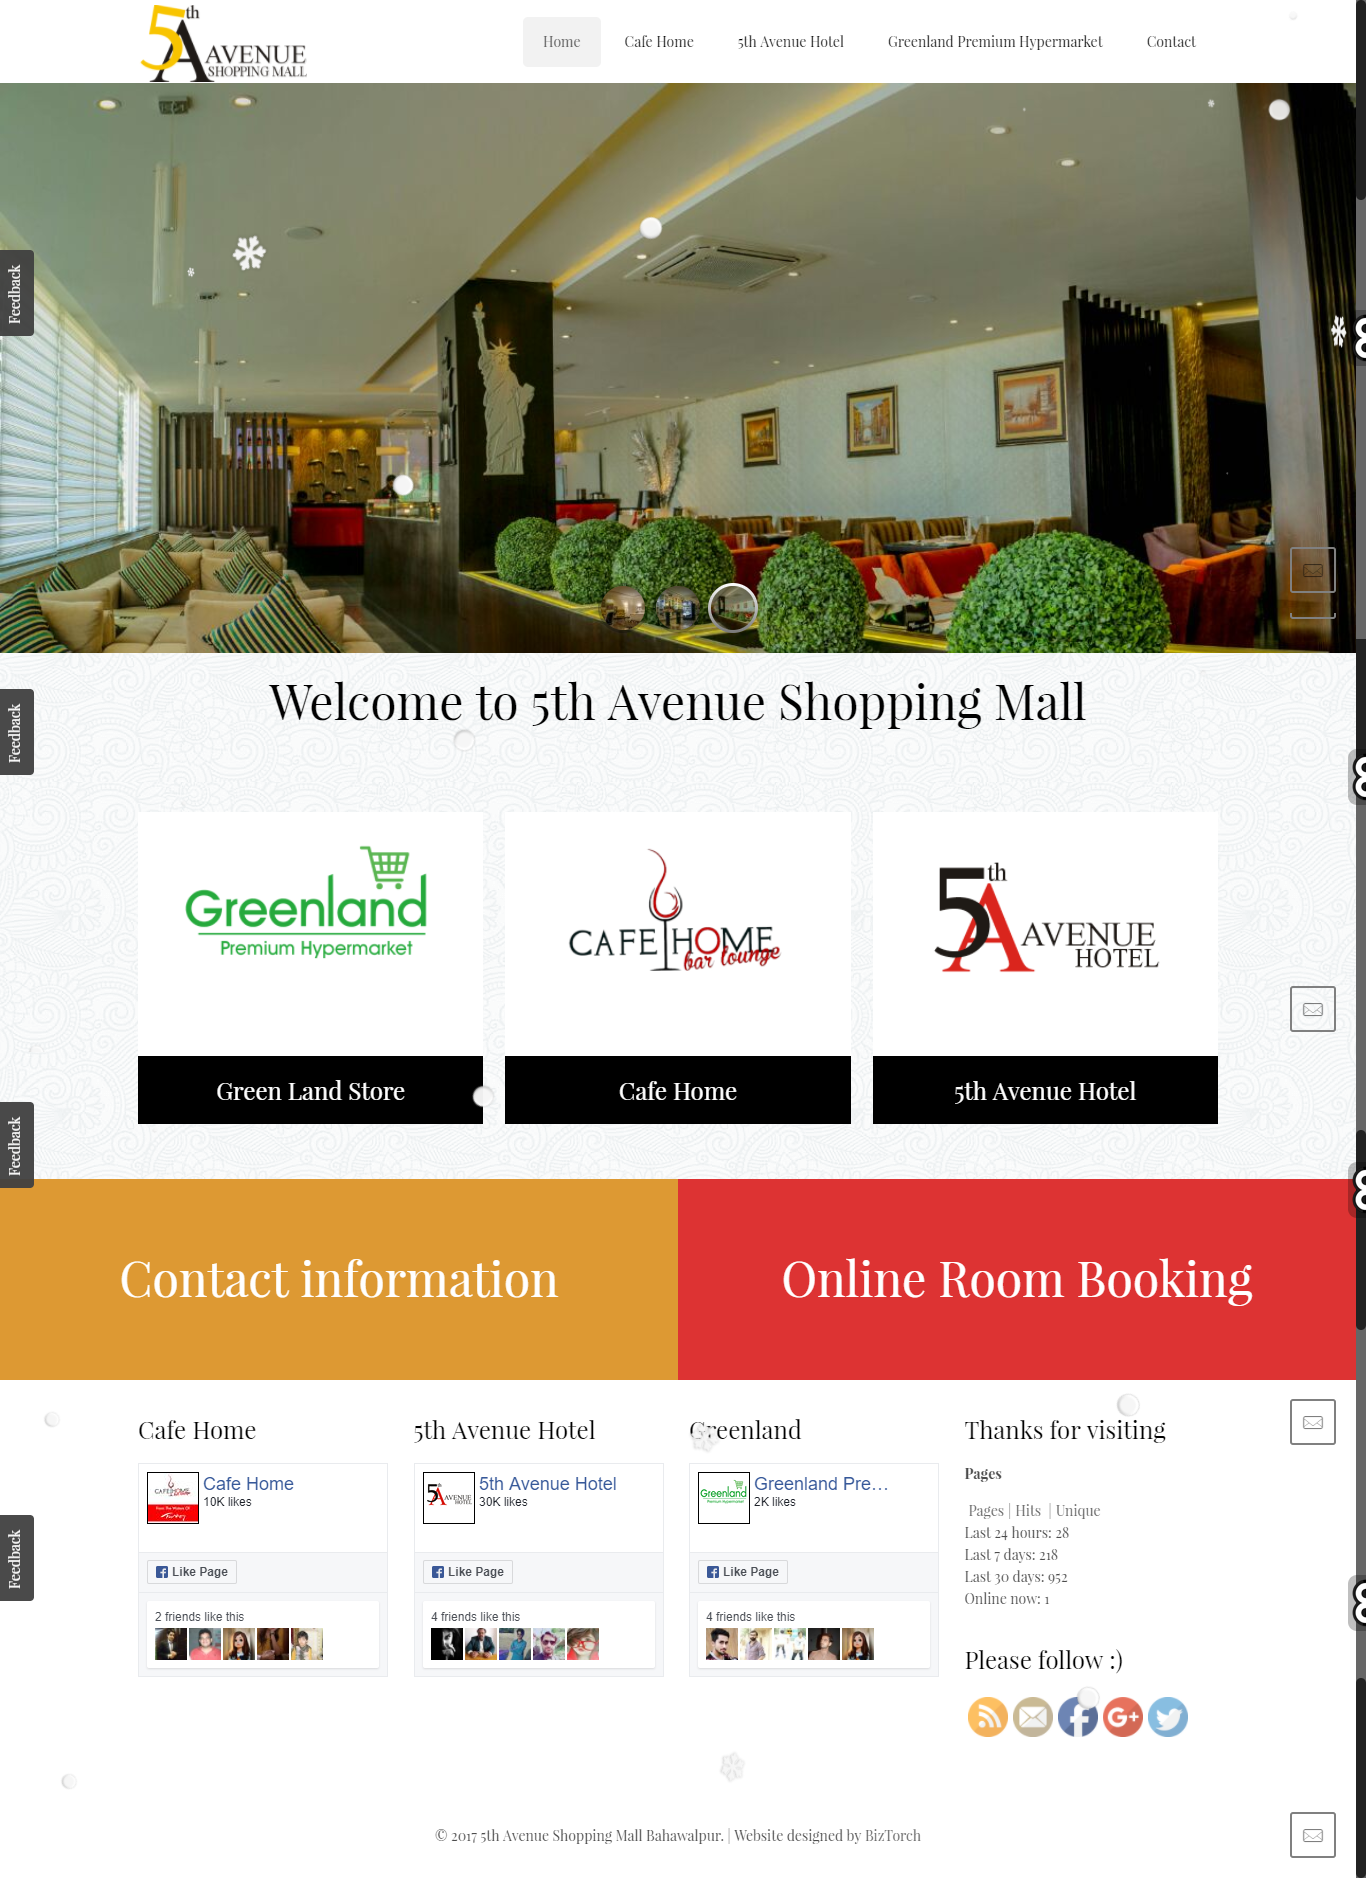 5th Avenue Shoping Mall